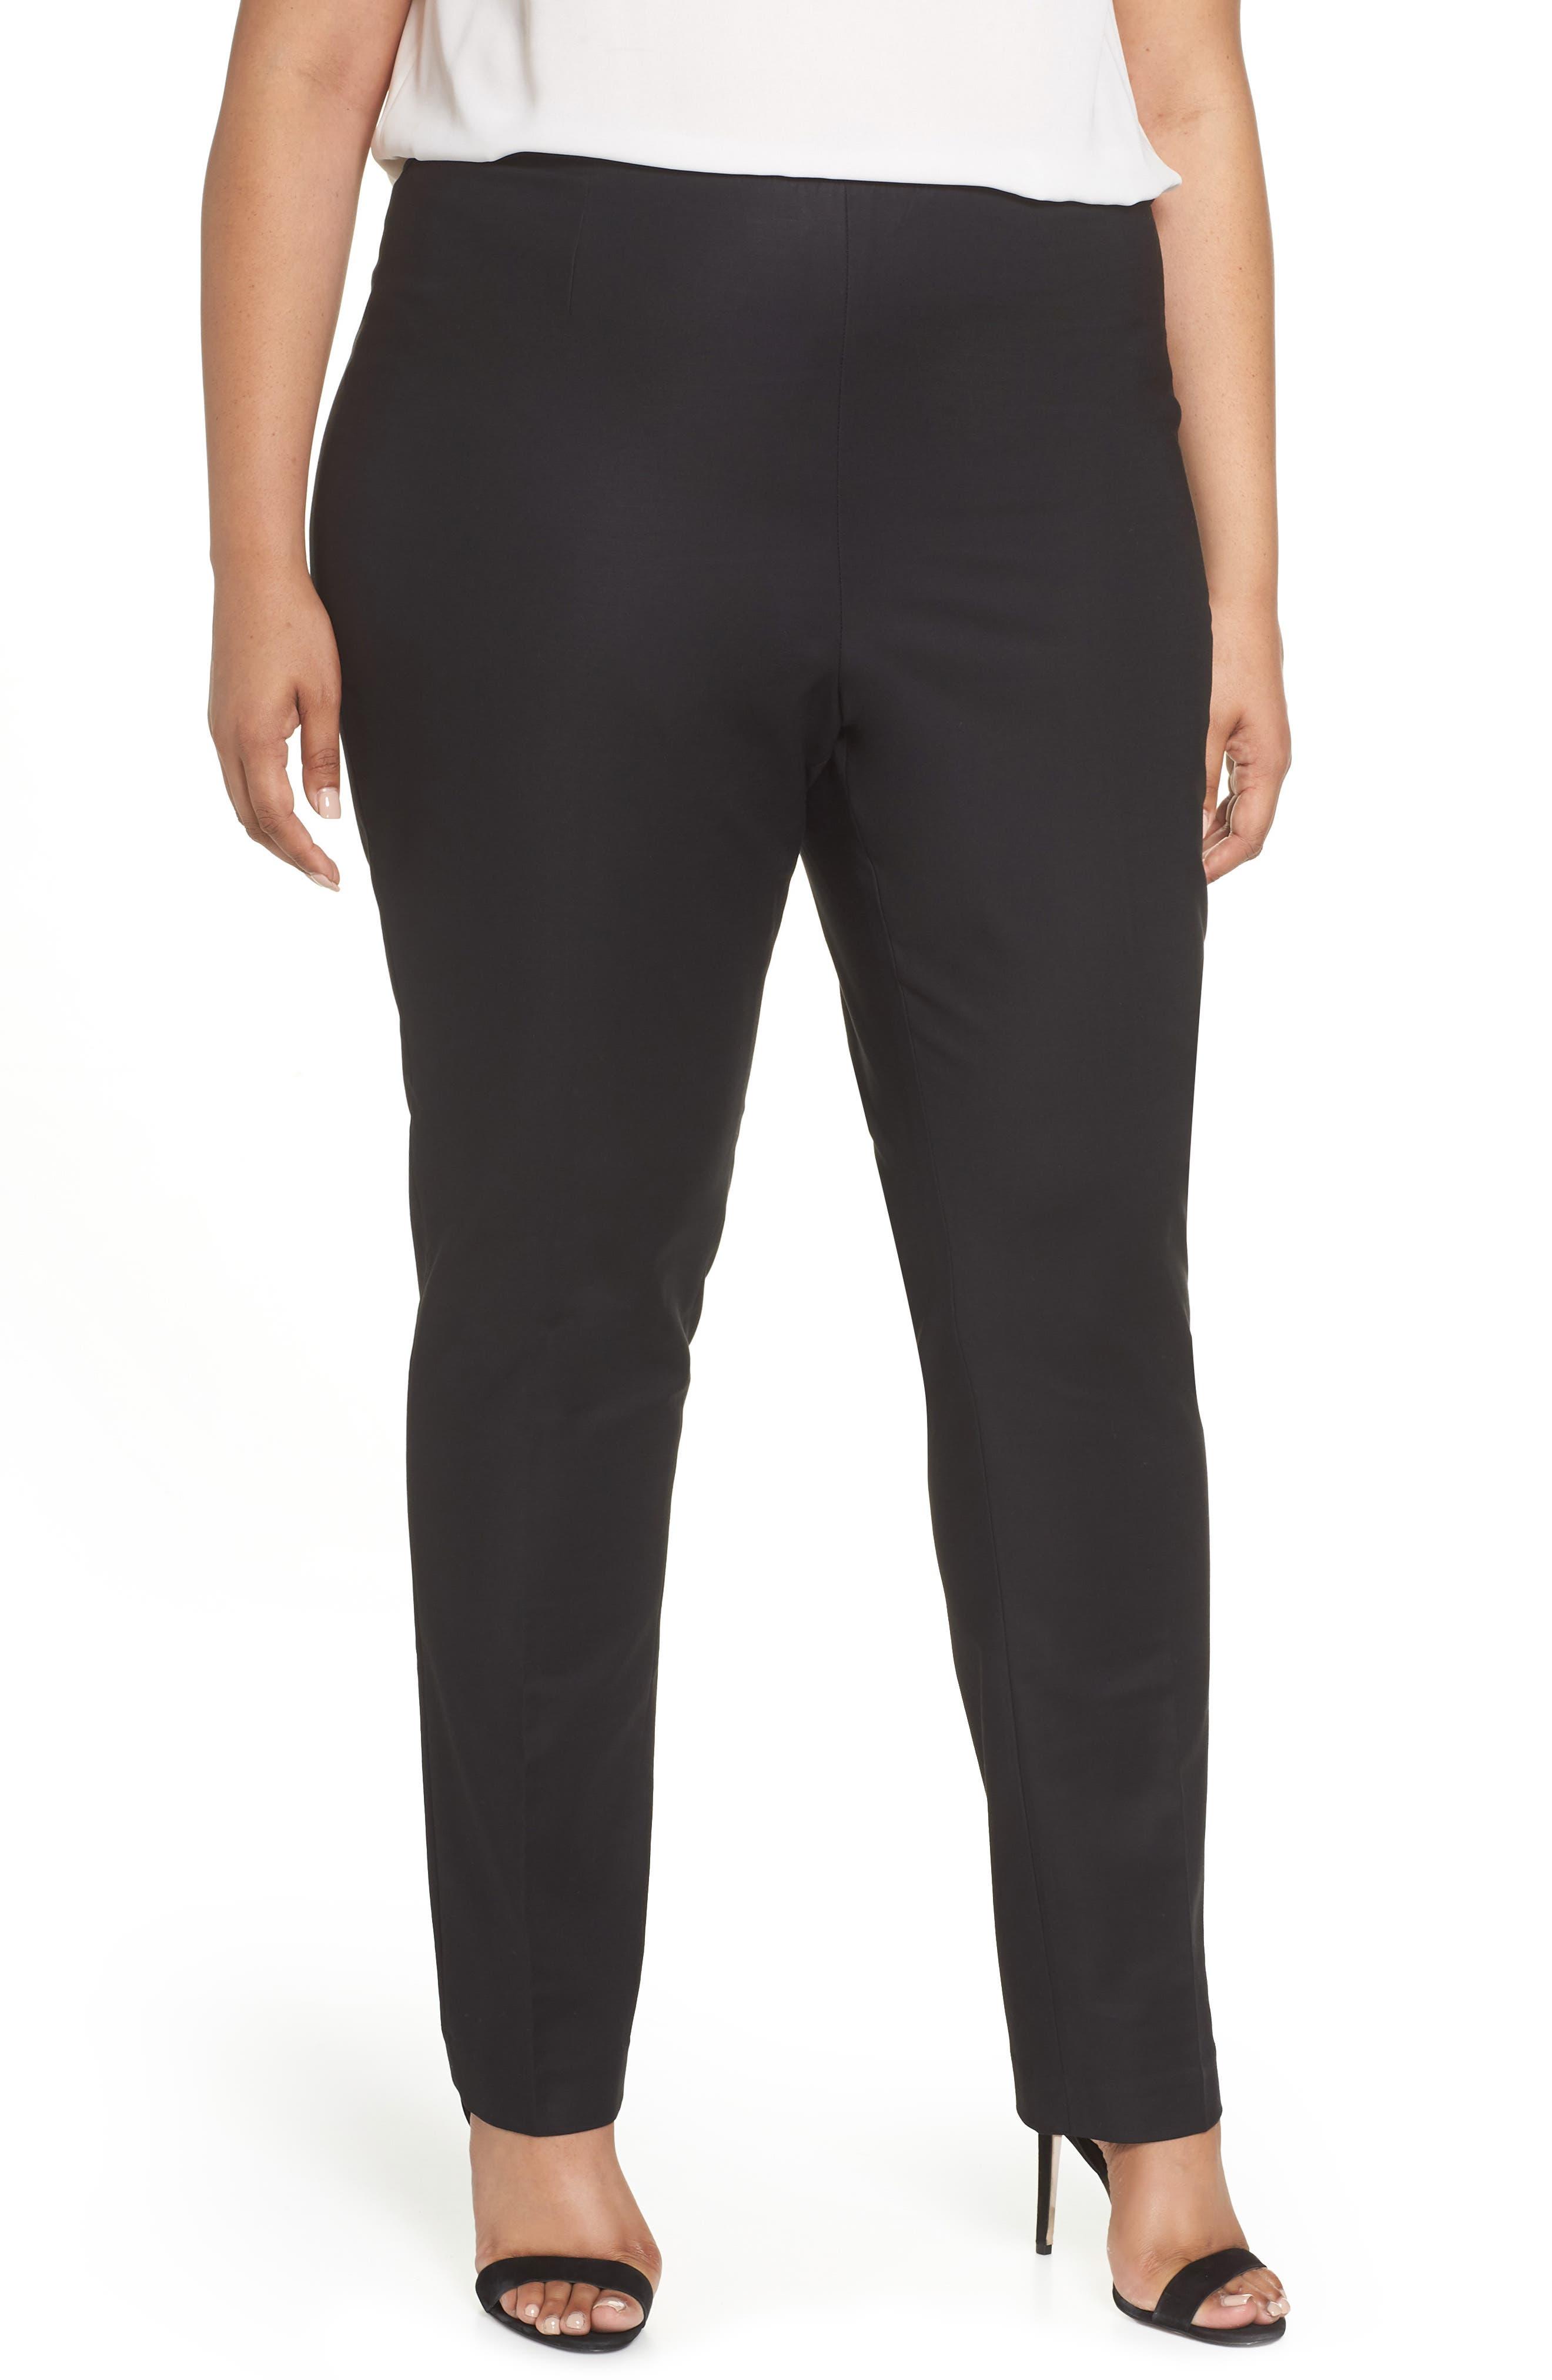 NIC+ZOE 'Perfect' Side Zip Pants, Main, color, BLACK ONYX